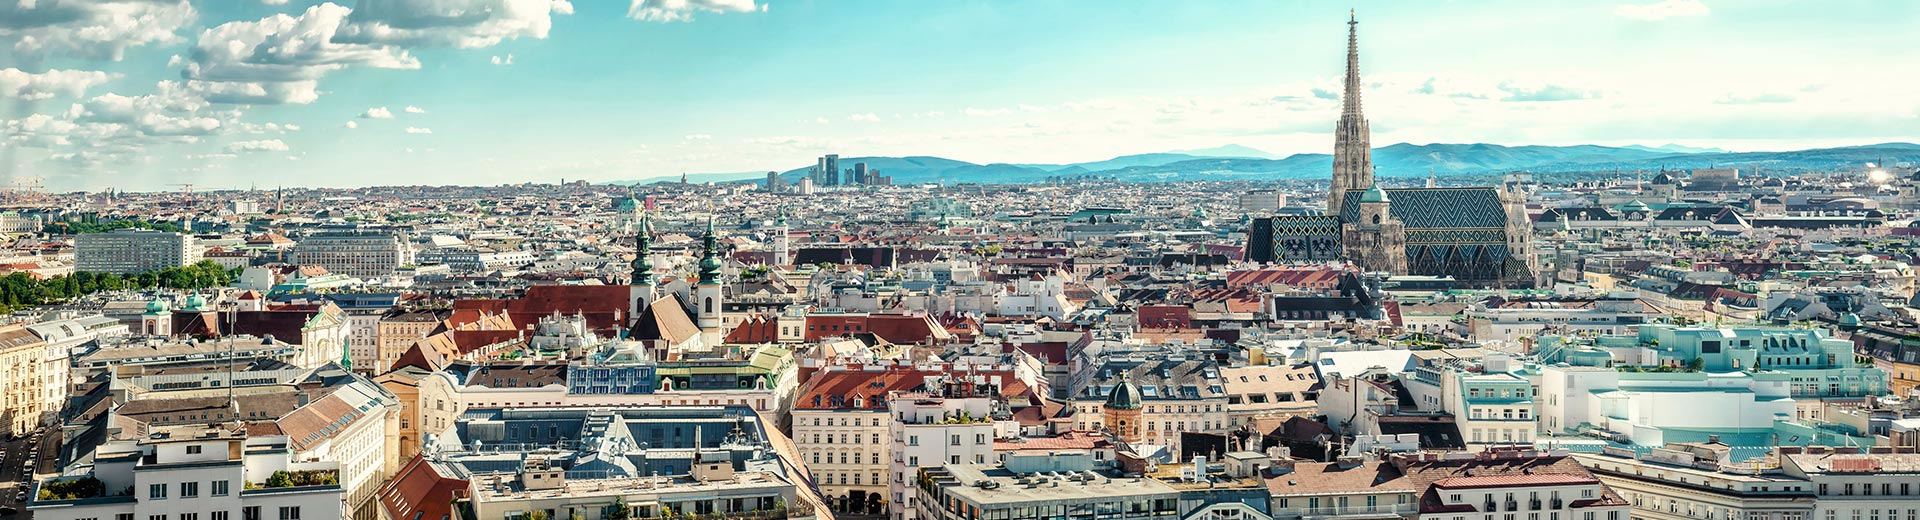 Gruppenreise Wien - Package Gruppen Select Flug